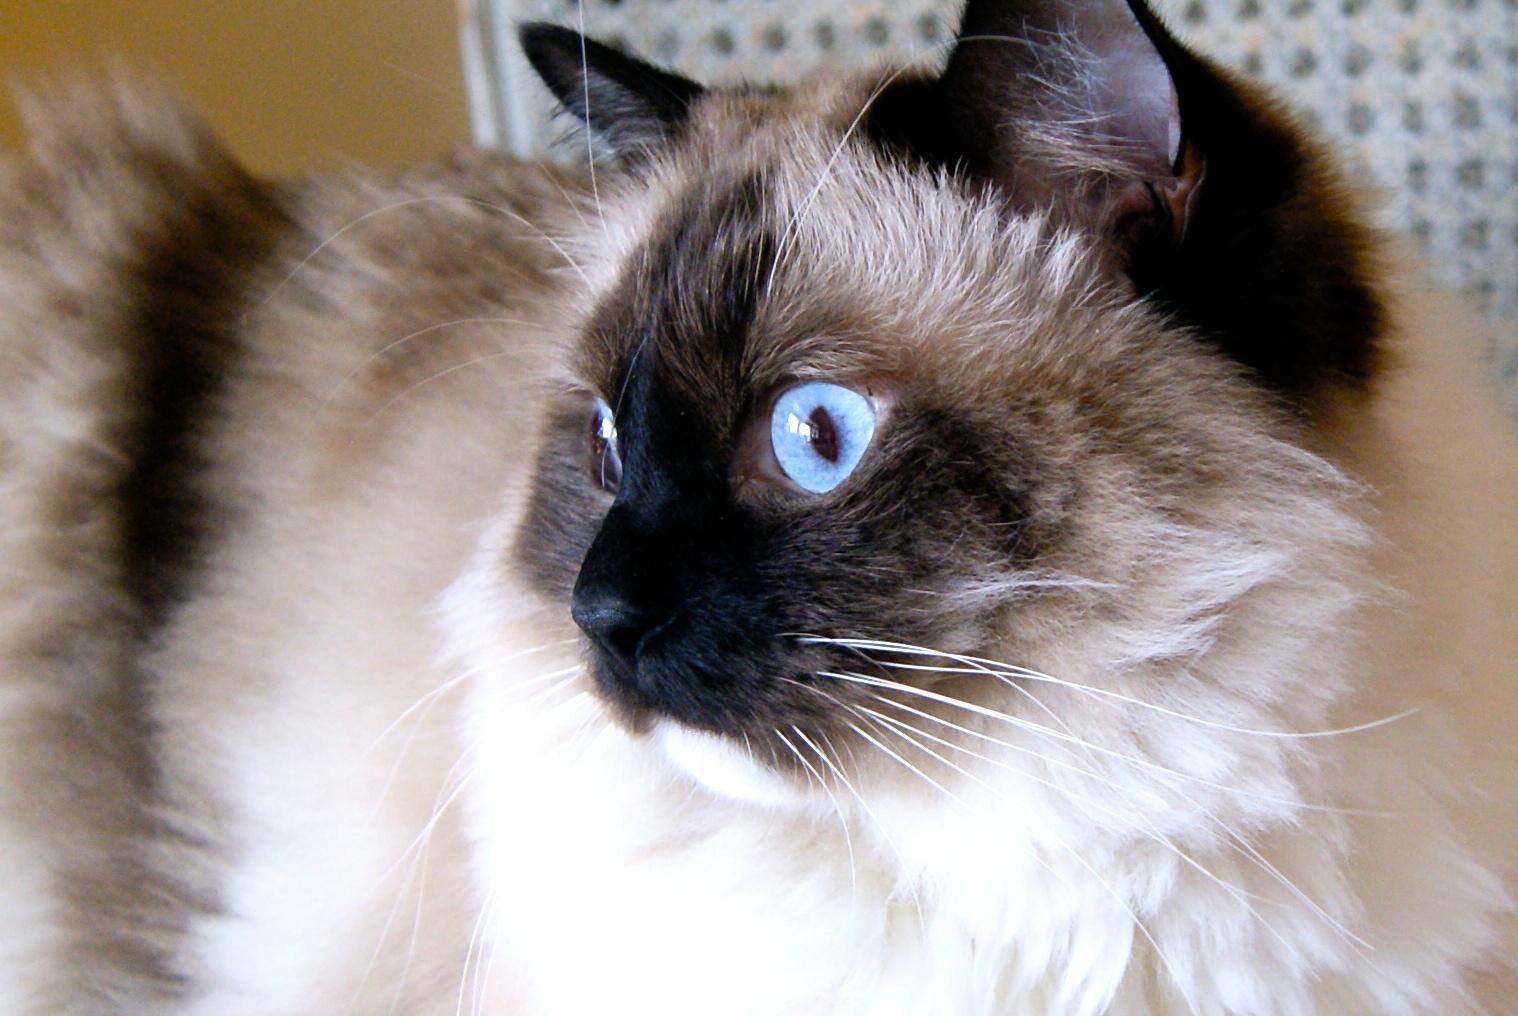 L Pendergrasts Apbiology Genetics Different Alleles For Cat Eye